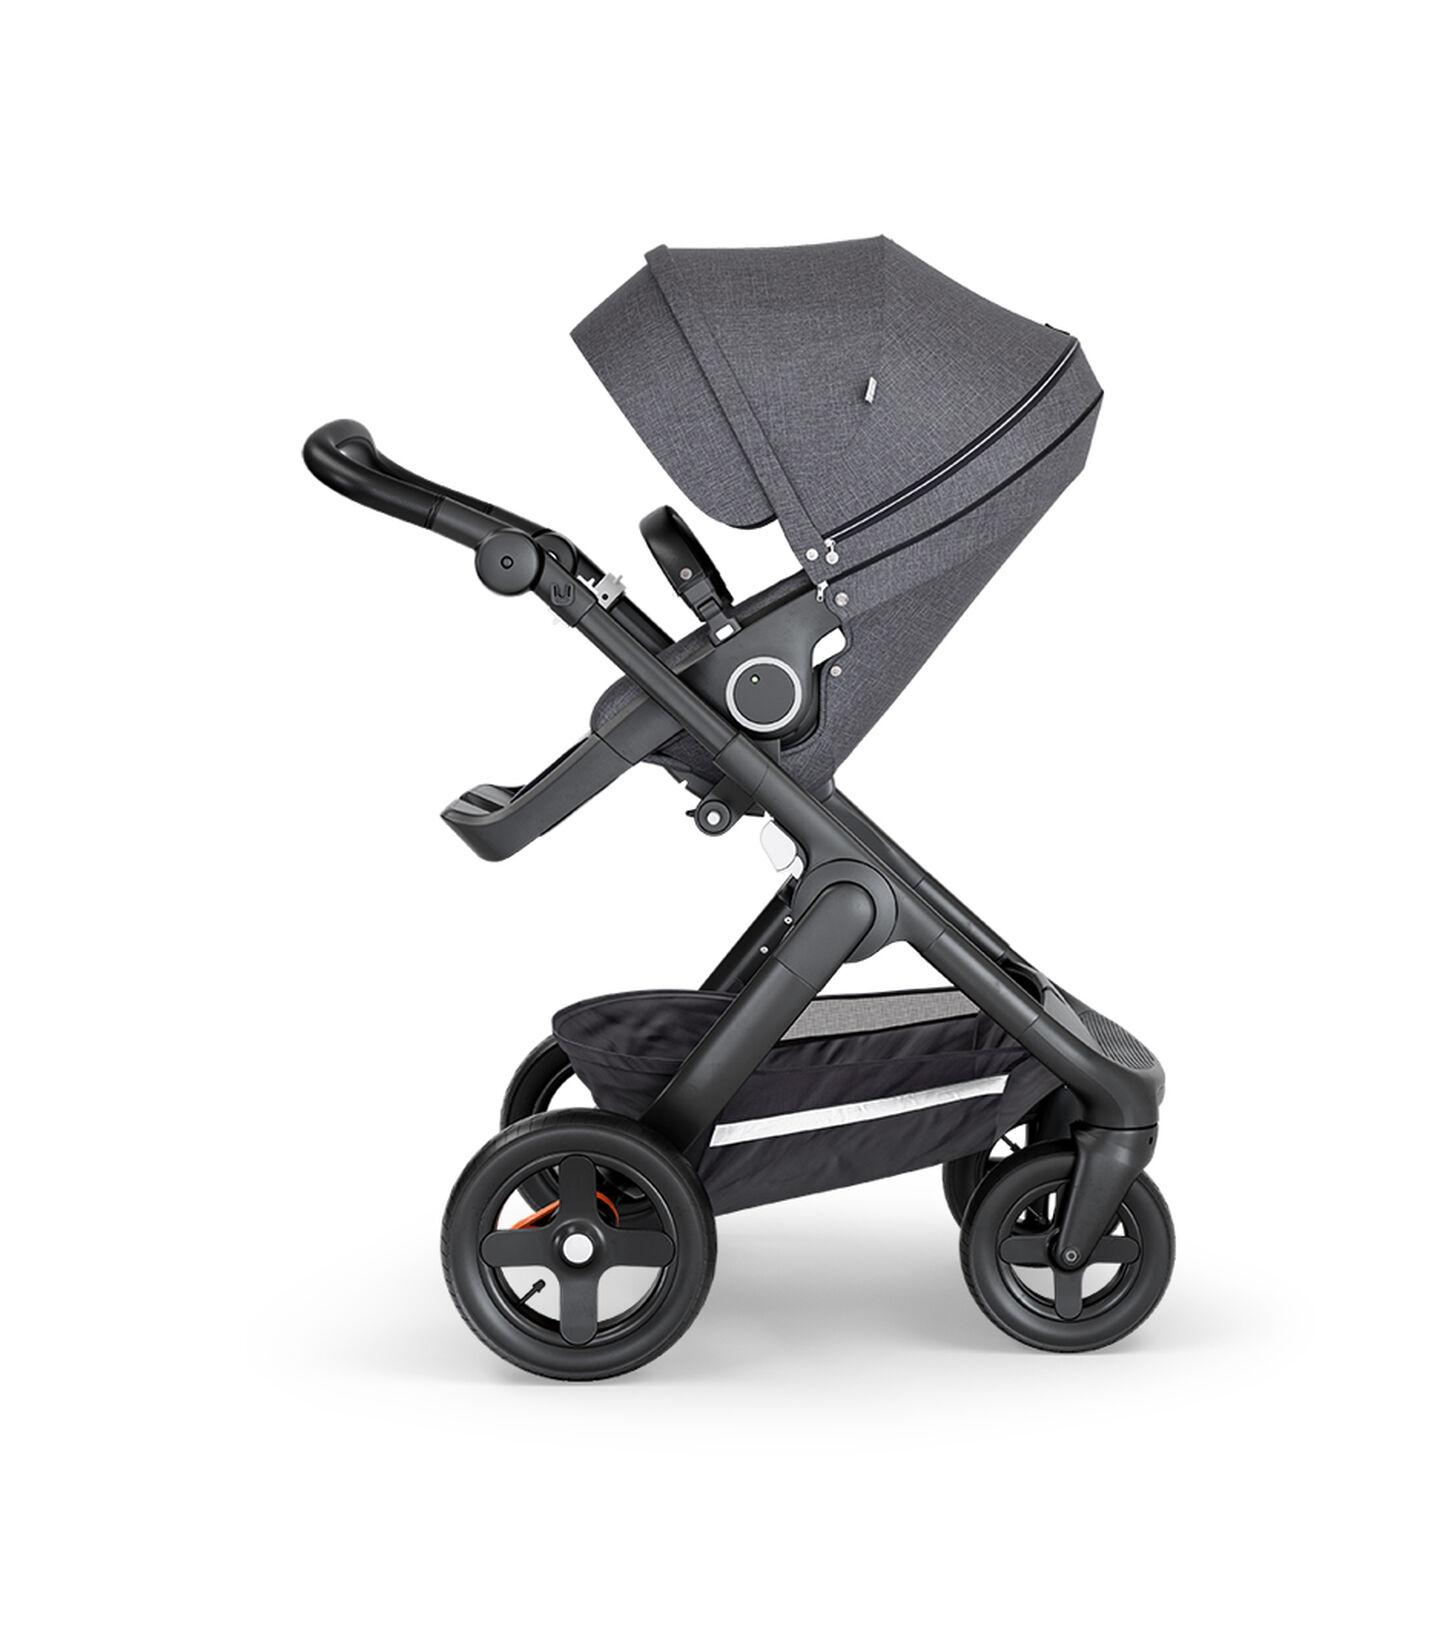 Stokke® Trailz™ with Black Chassis, Black Leatherette and Terrain Wheels. Stokke® Stroller Seat, Black Melange. view 2